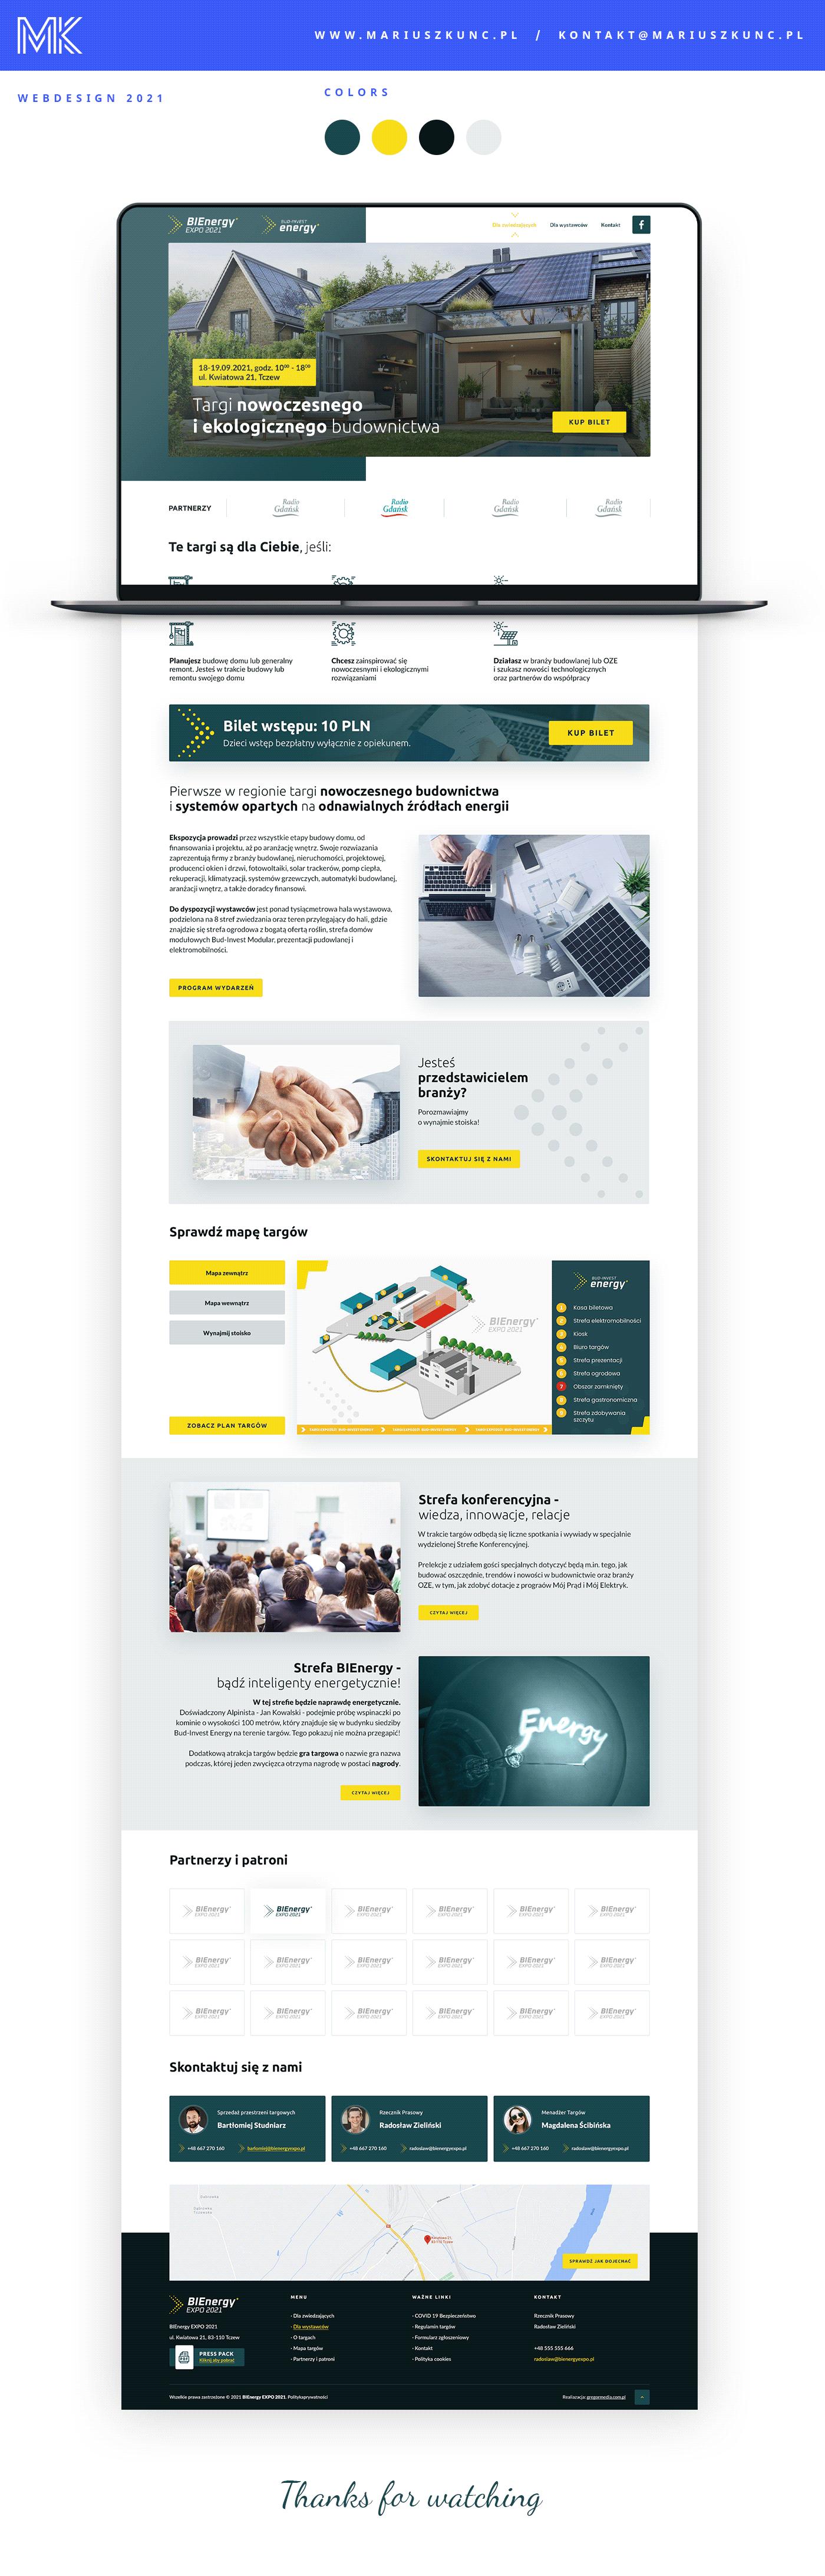 energy Experience landing page UI ui design UI/UX uidesign user interface ux Web Design